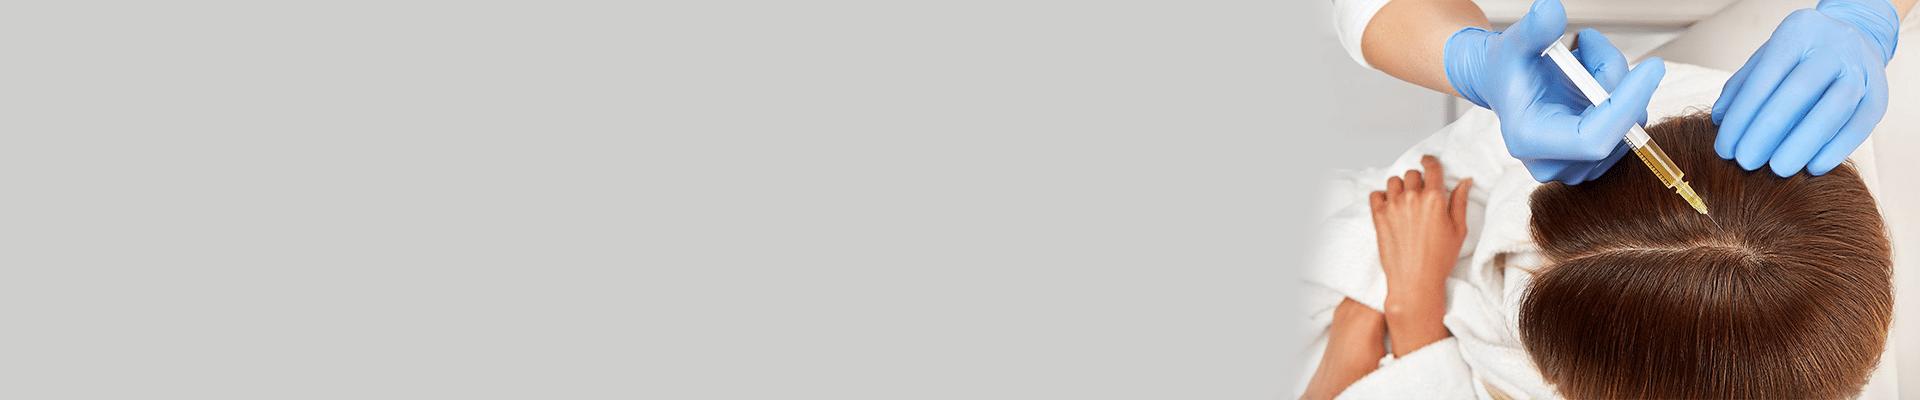 [:fr]PRP Nabeul Hammamet : pour un visage plus jeune et des cheveux plus denses[:ar]البلازما الغنية بالصفائح الدموية في نابل الحمامات: لوجه أصغر و شعر أكثر كثافة [:]